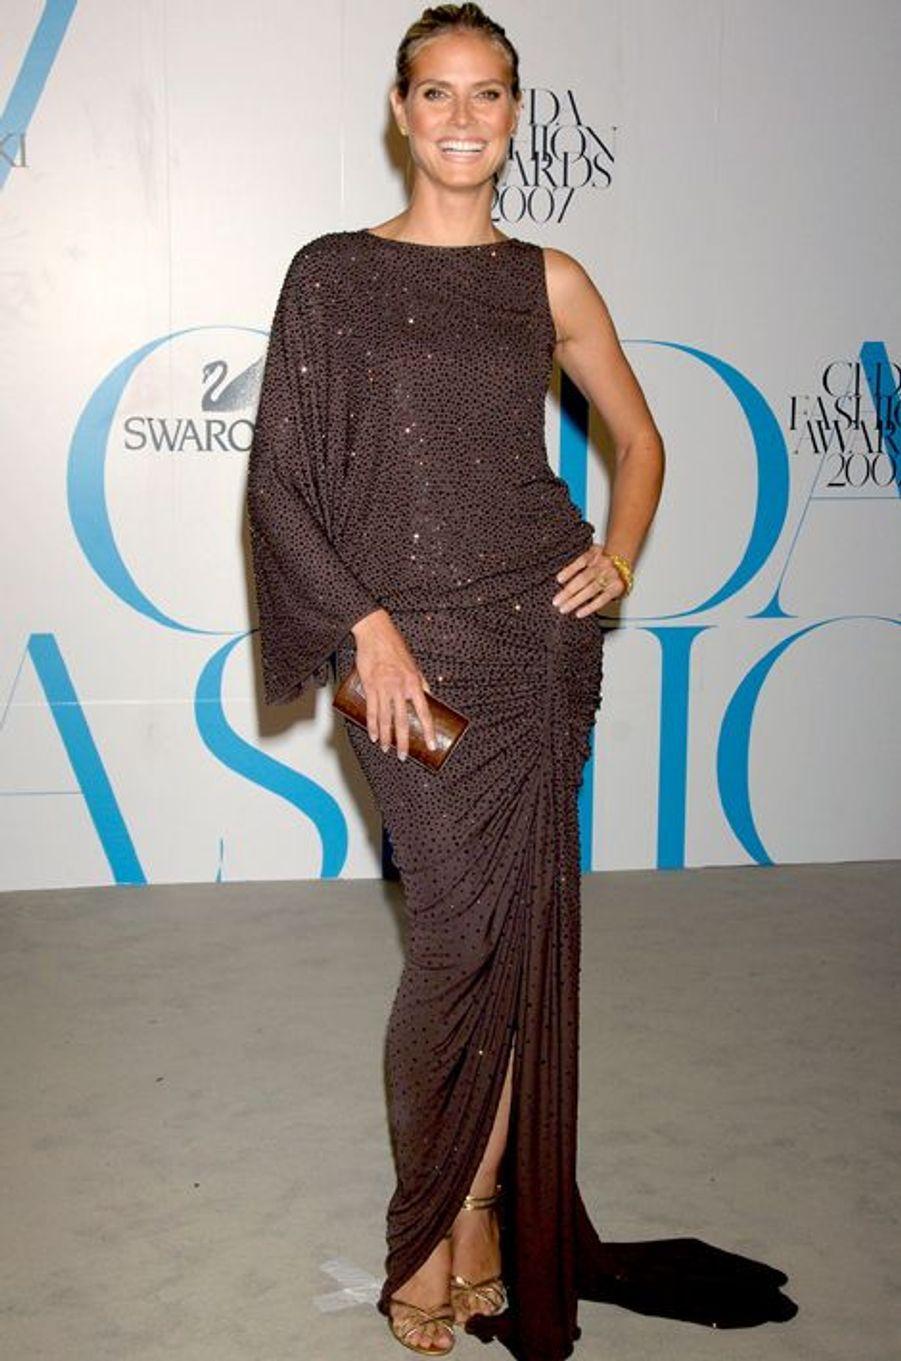 Aux CFDA Fashion Awards, en juin 2007